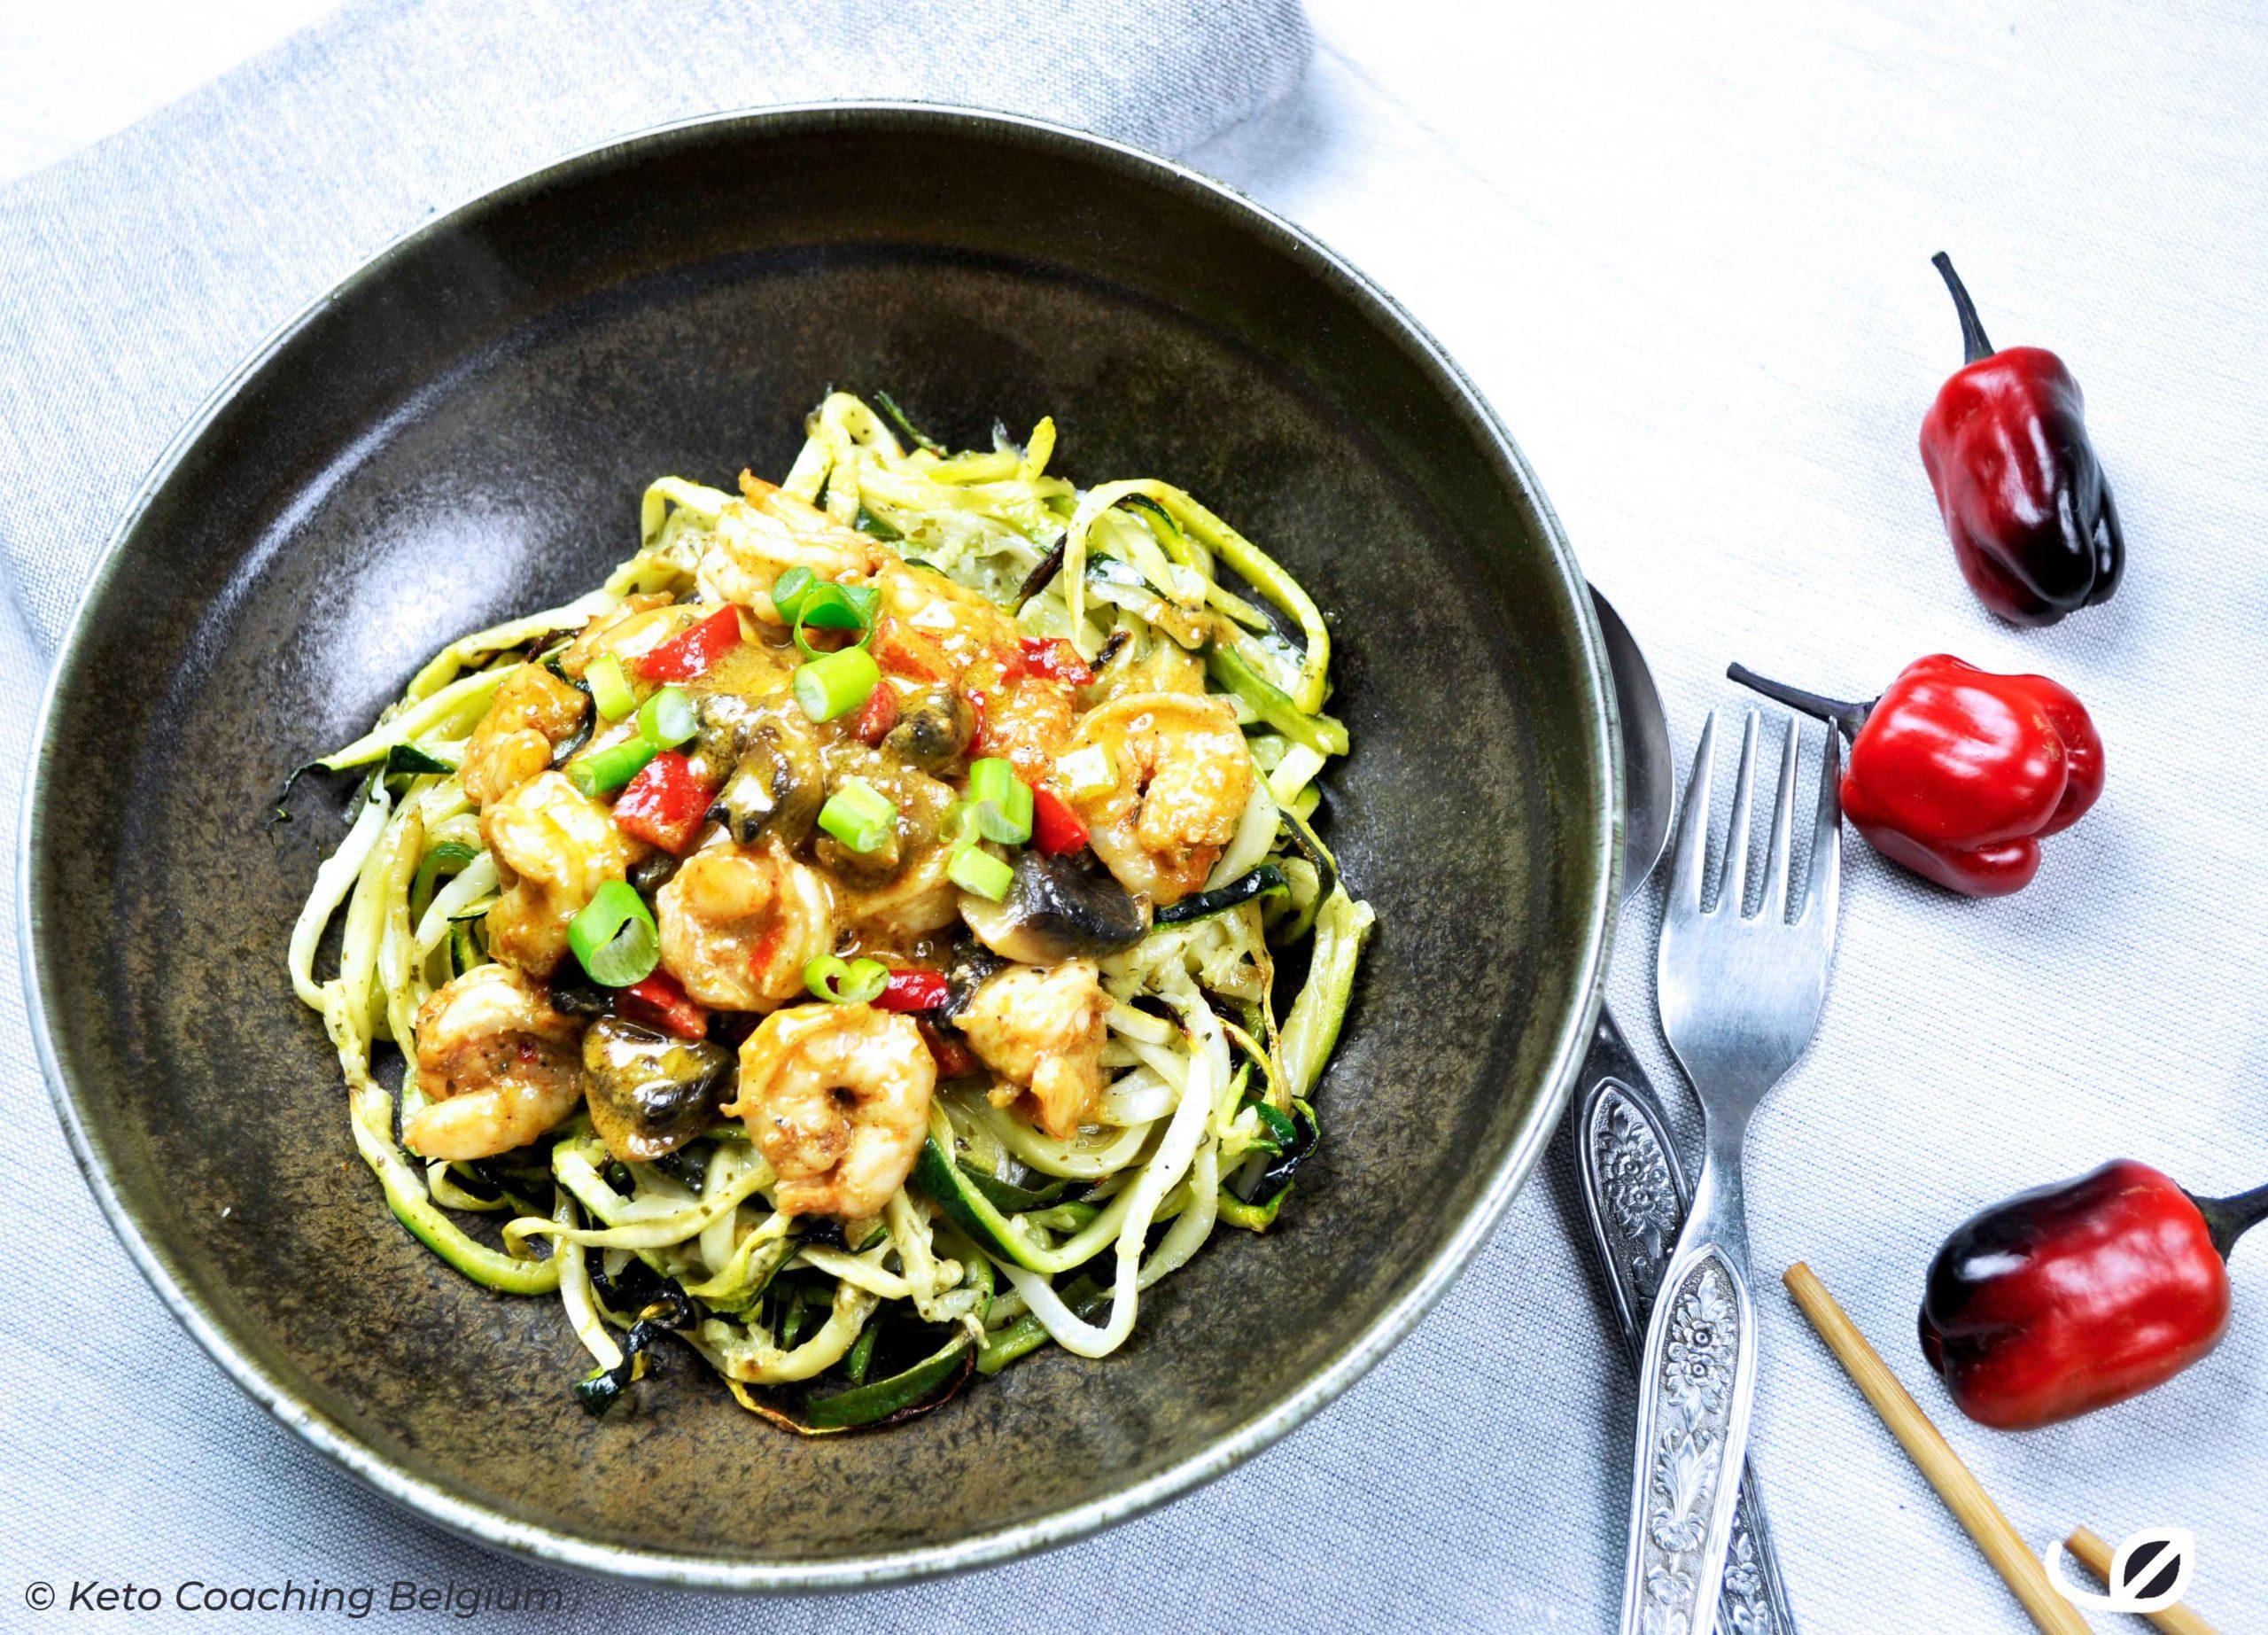 Keto Scampi Diabolique met courgette en aubergine noodles courgetti en aubergini